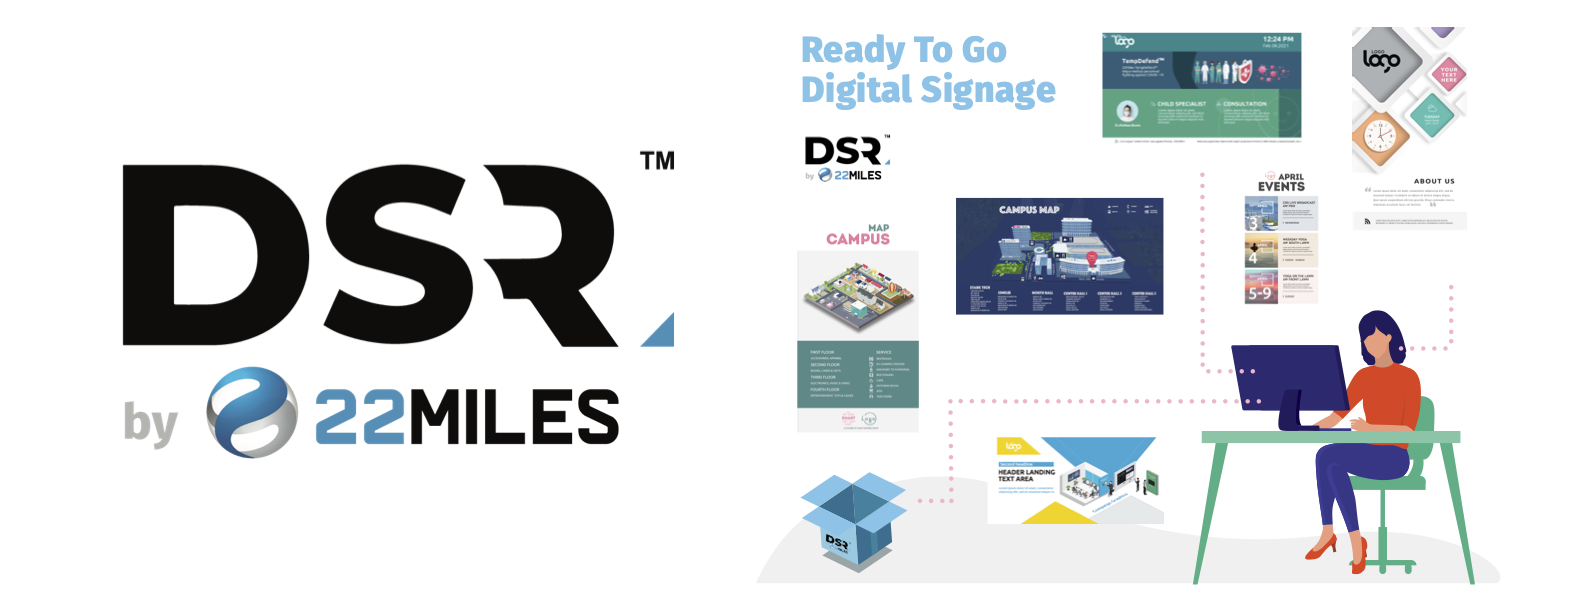 DSR header banner for Hub spot landing pages.JPG